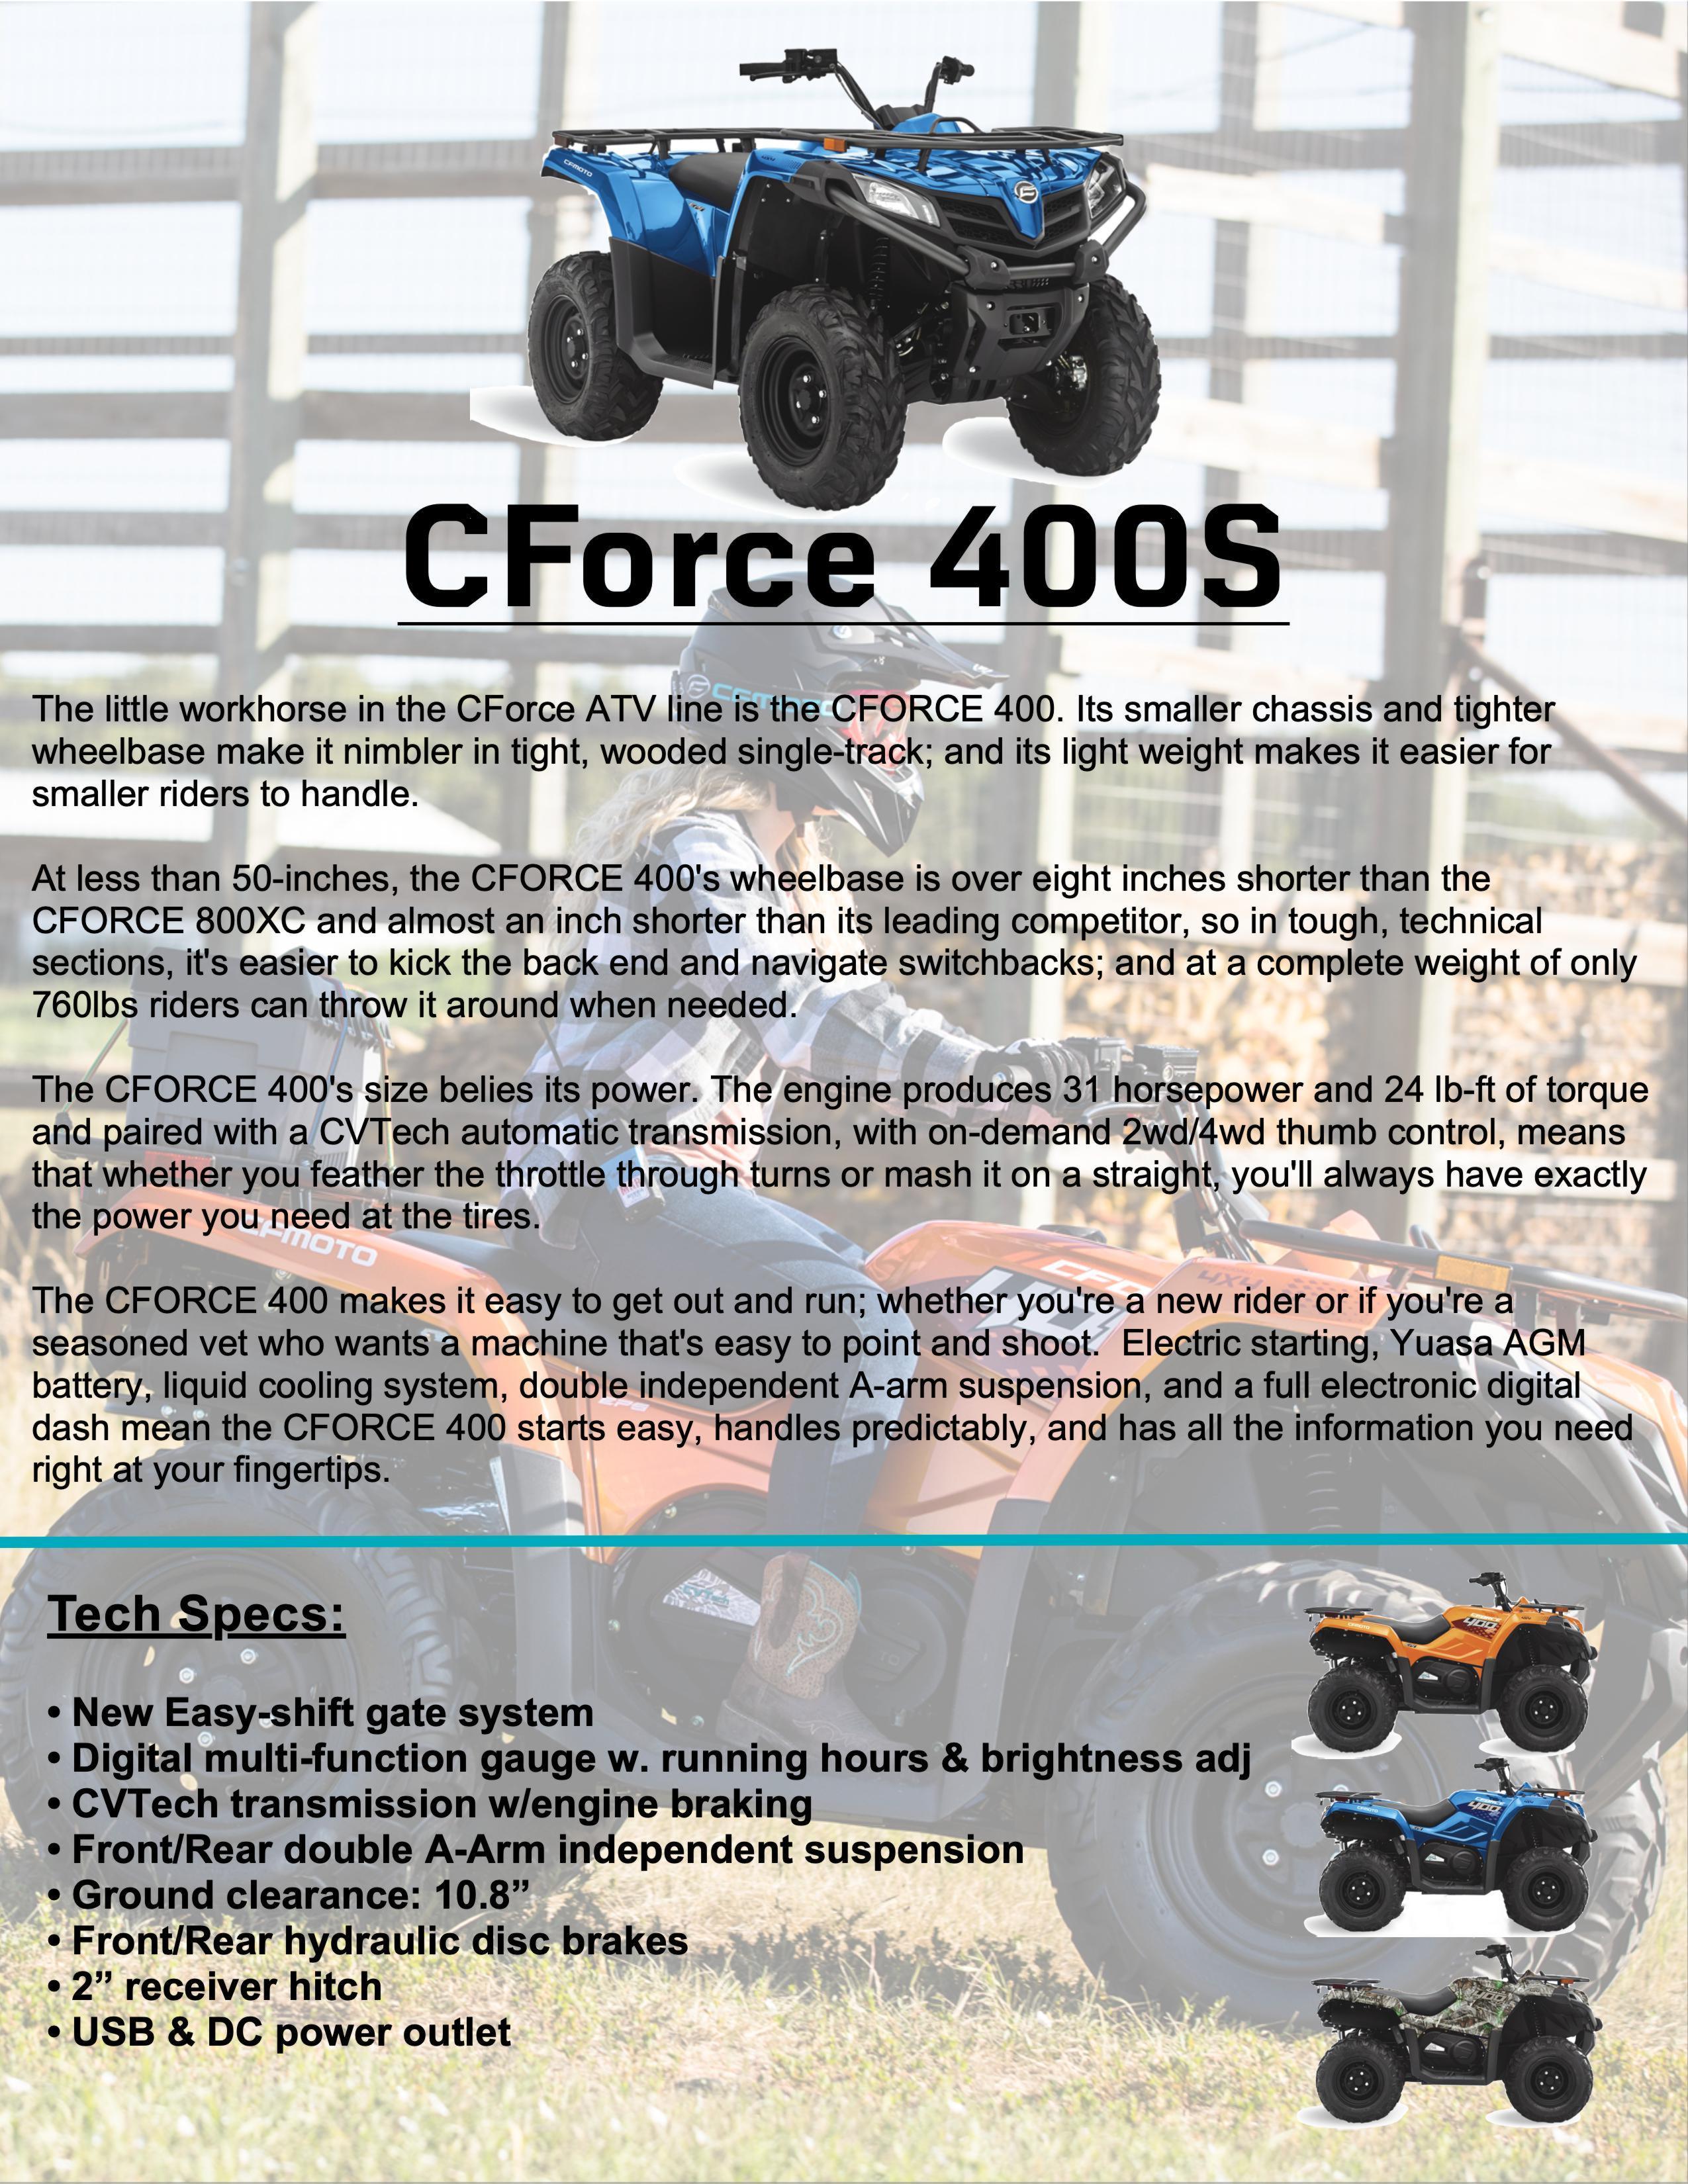 CFORCE 400s